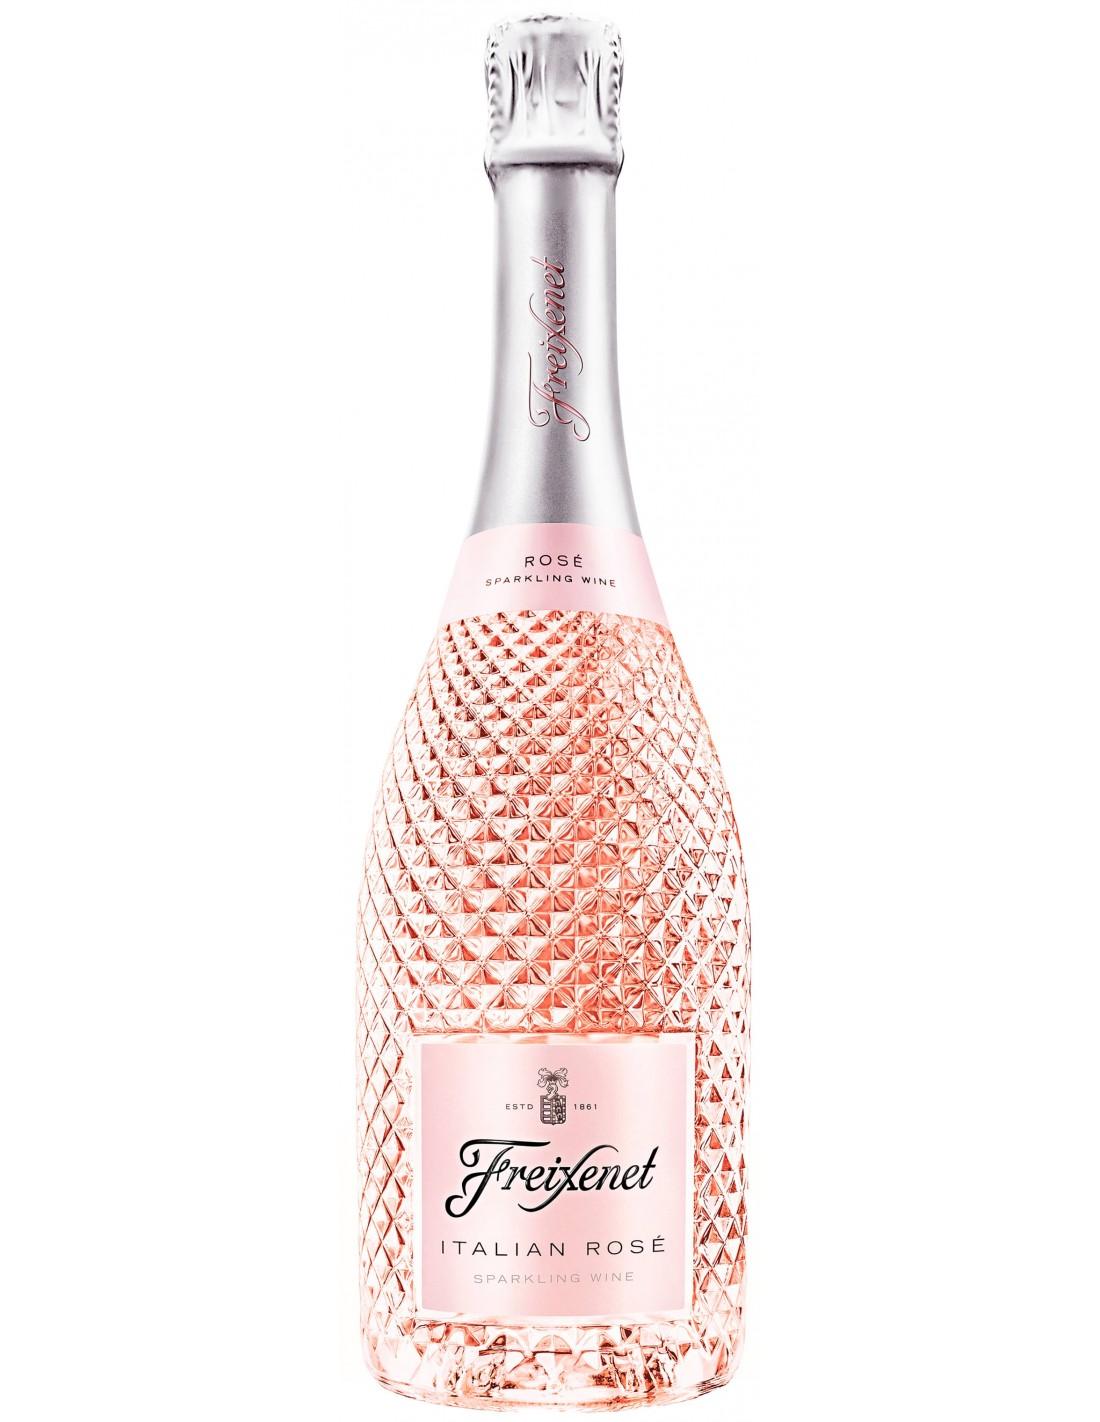 Vin spumant, Freixenet Italian Rose, 11% alc., 0.75L, Italia